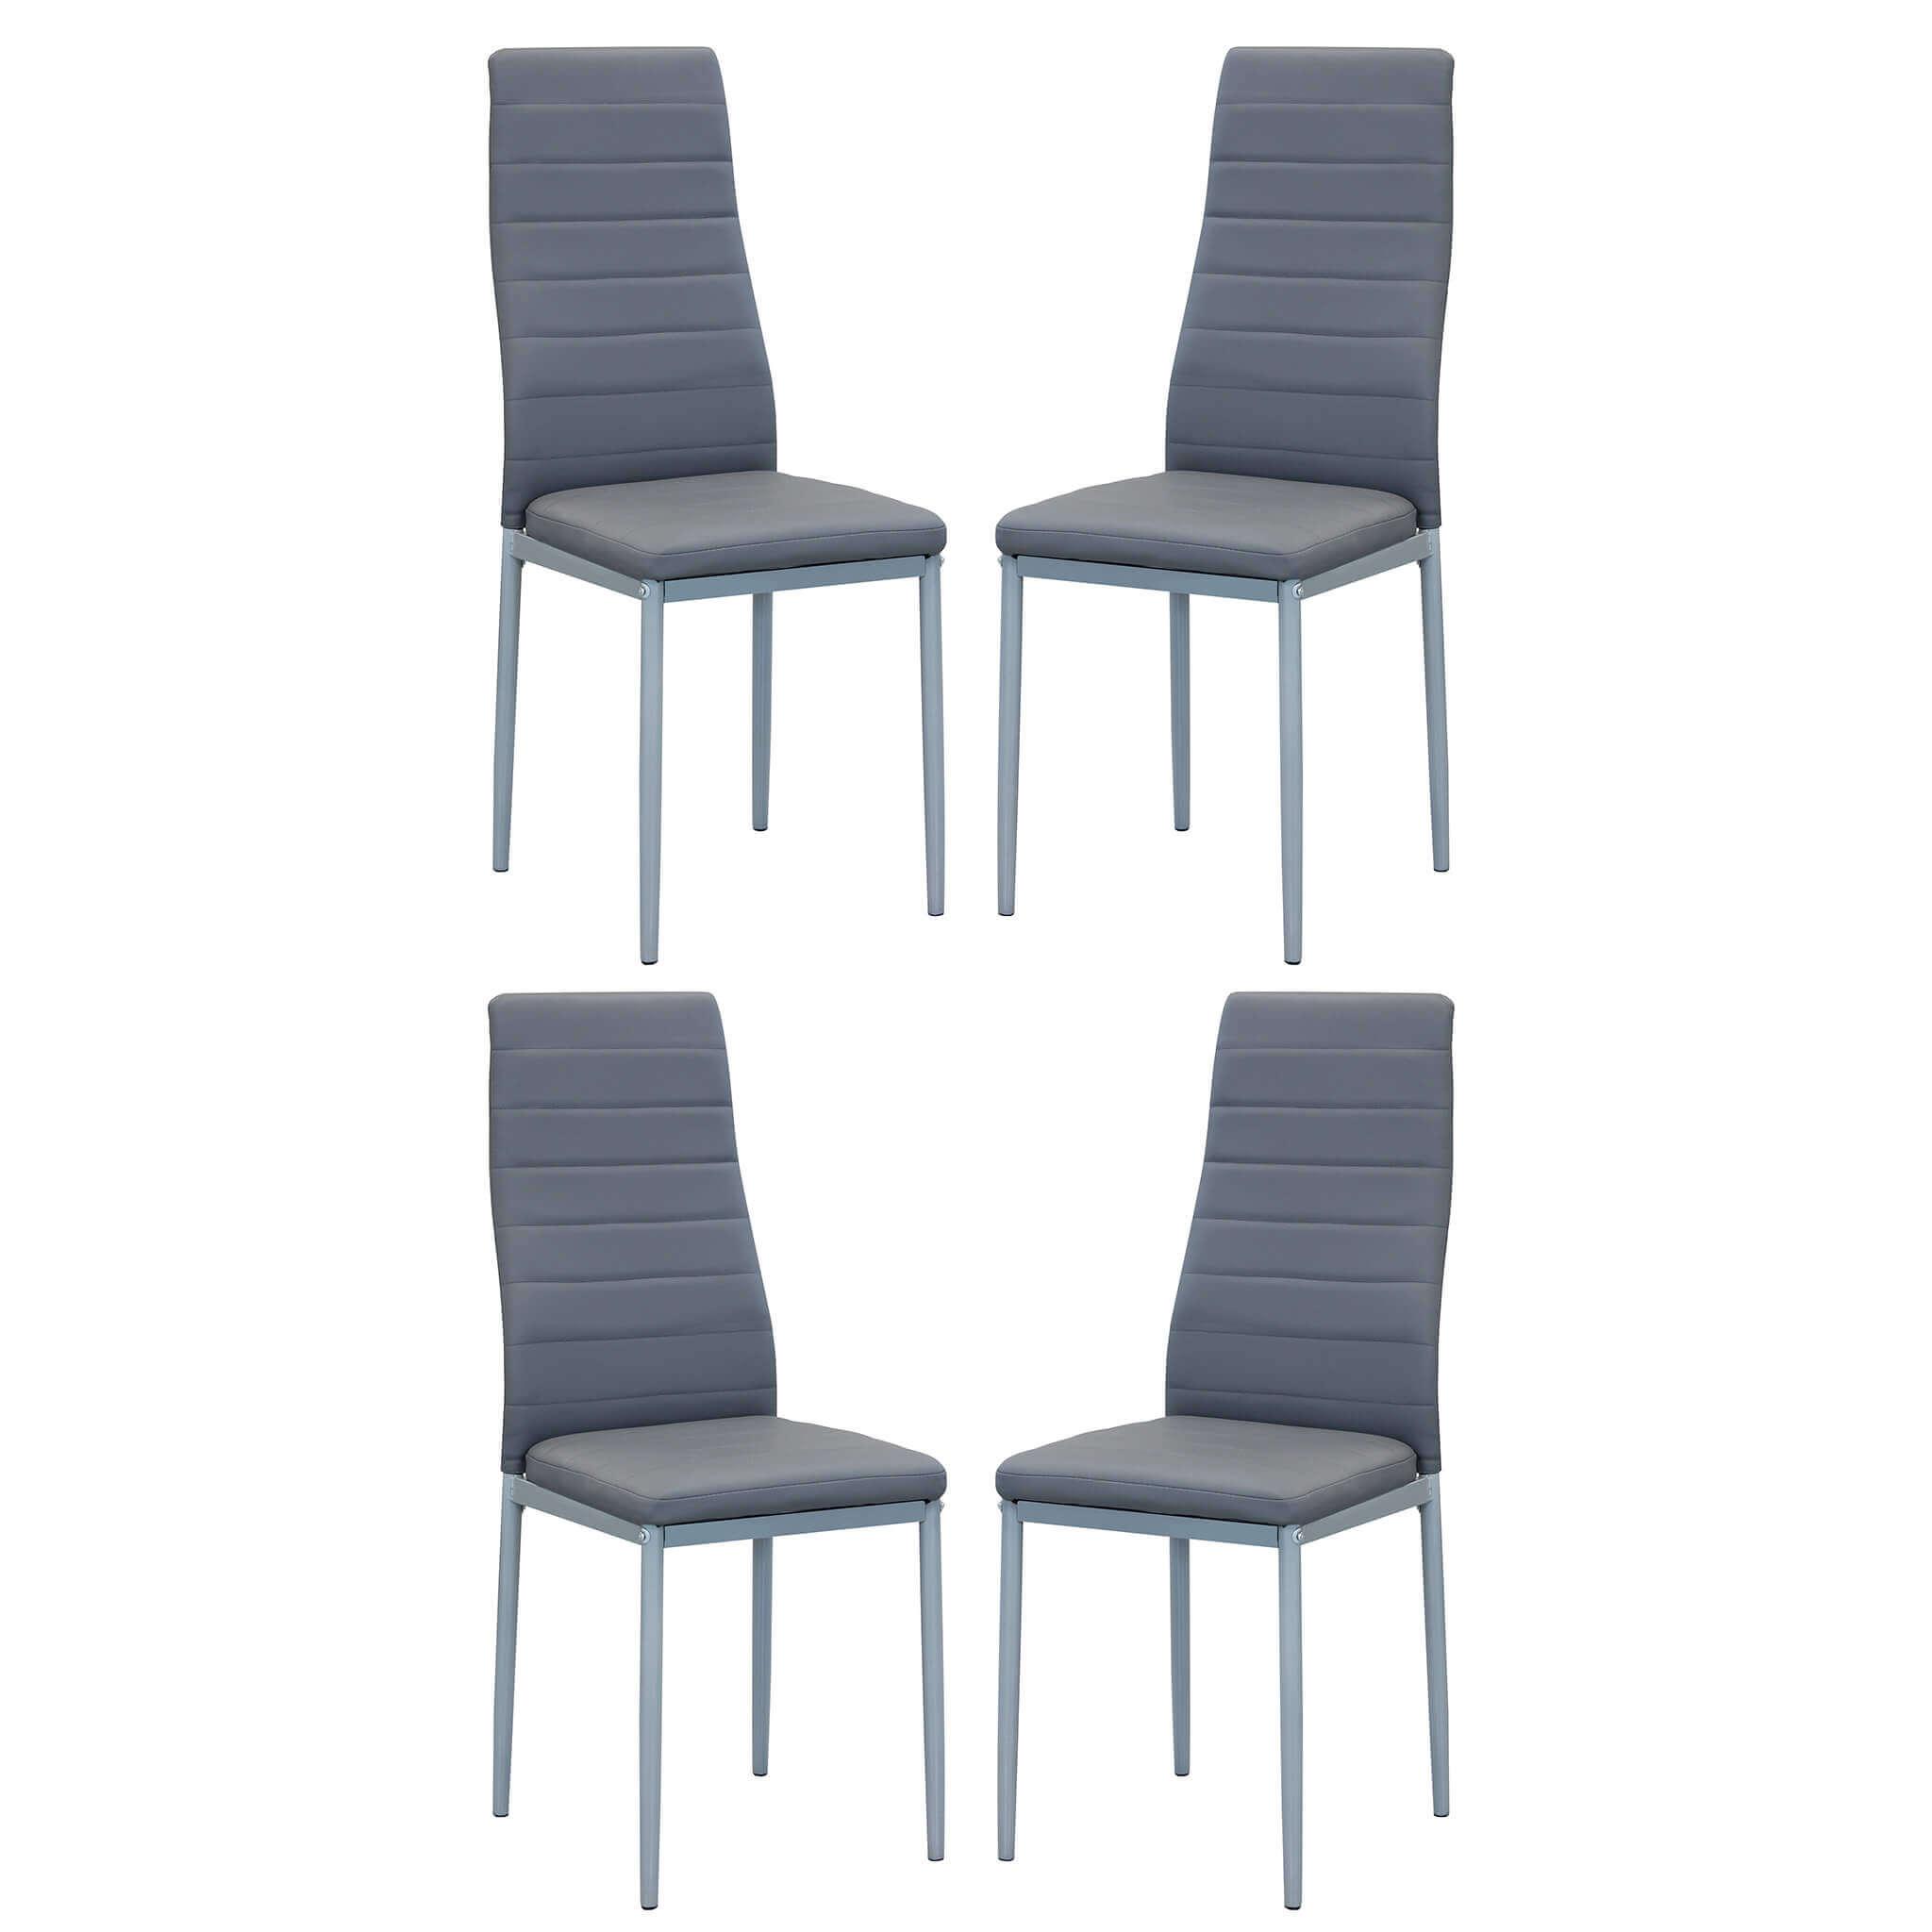 Milani Home FRITZ - set di 4 sedie in ecopelle